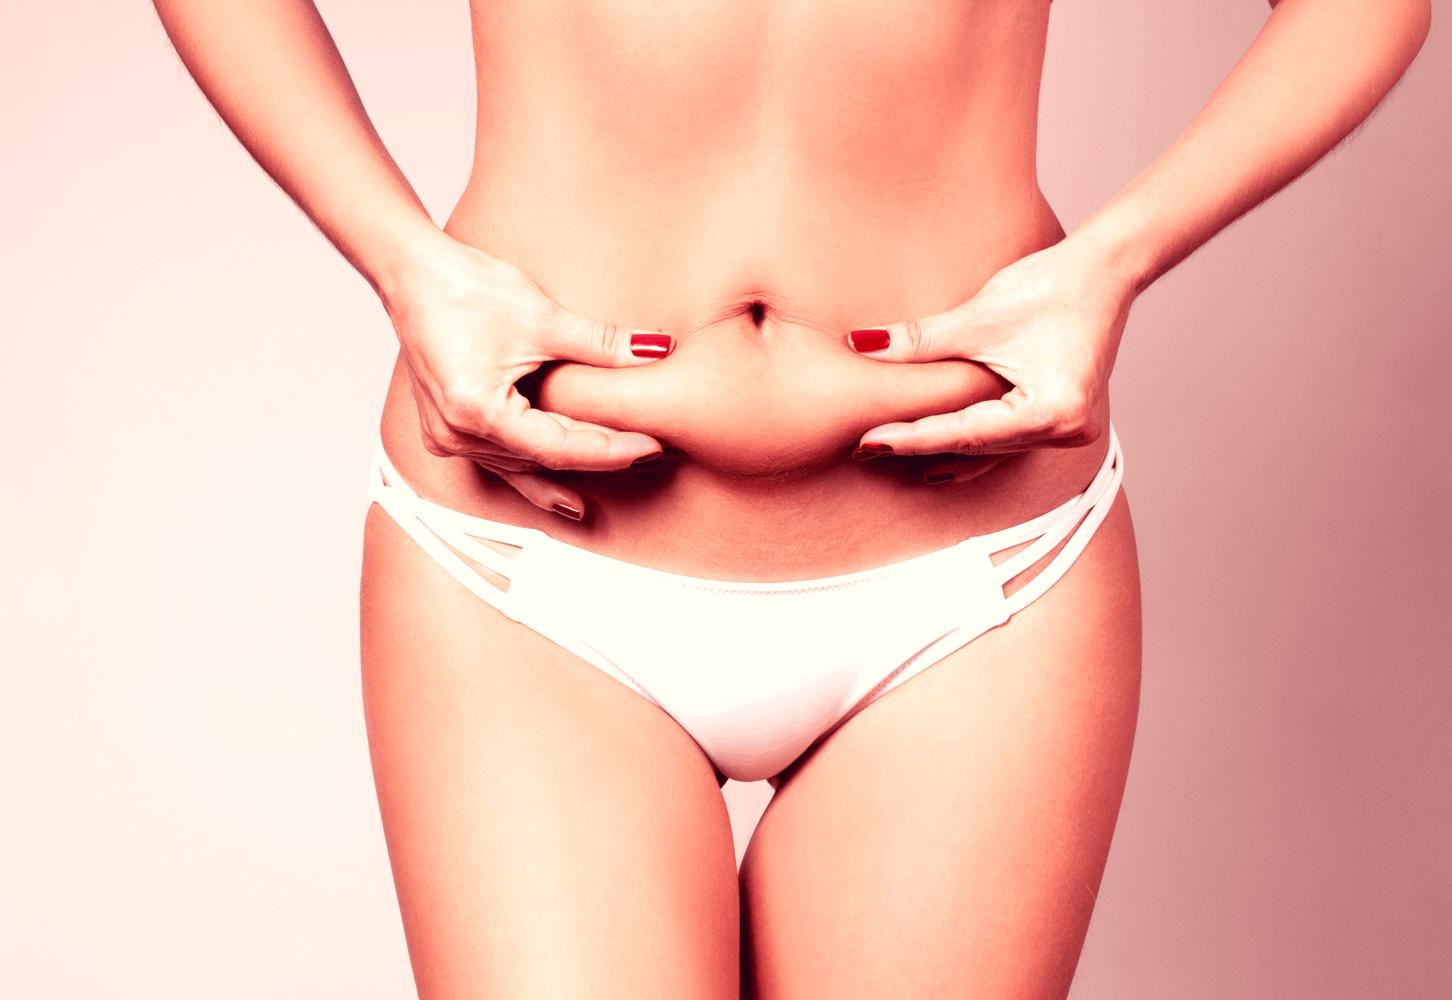 Skinny Fat Workout Plan Diet For Women Men Heydaydo